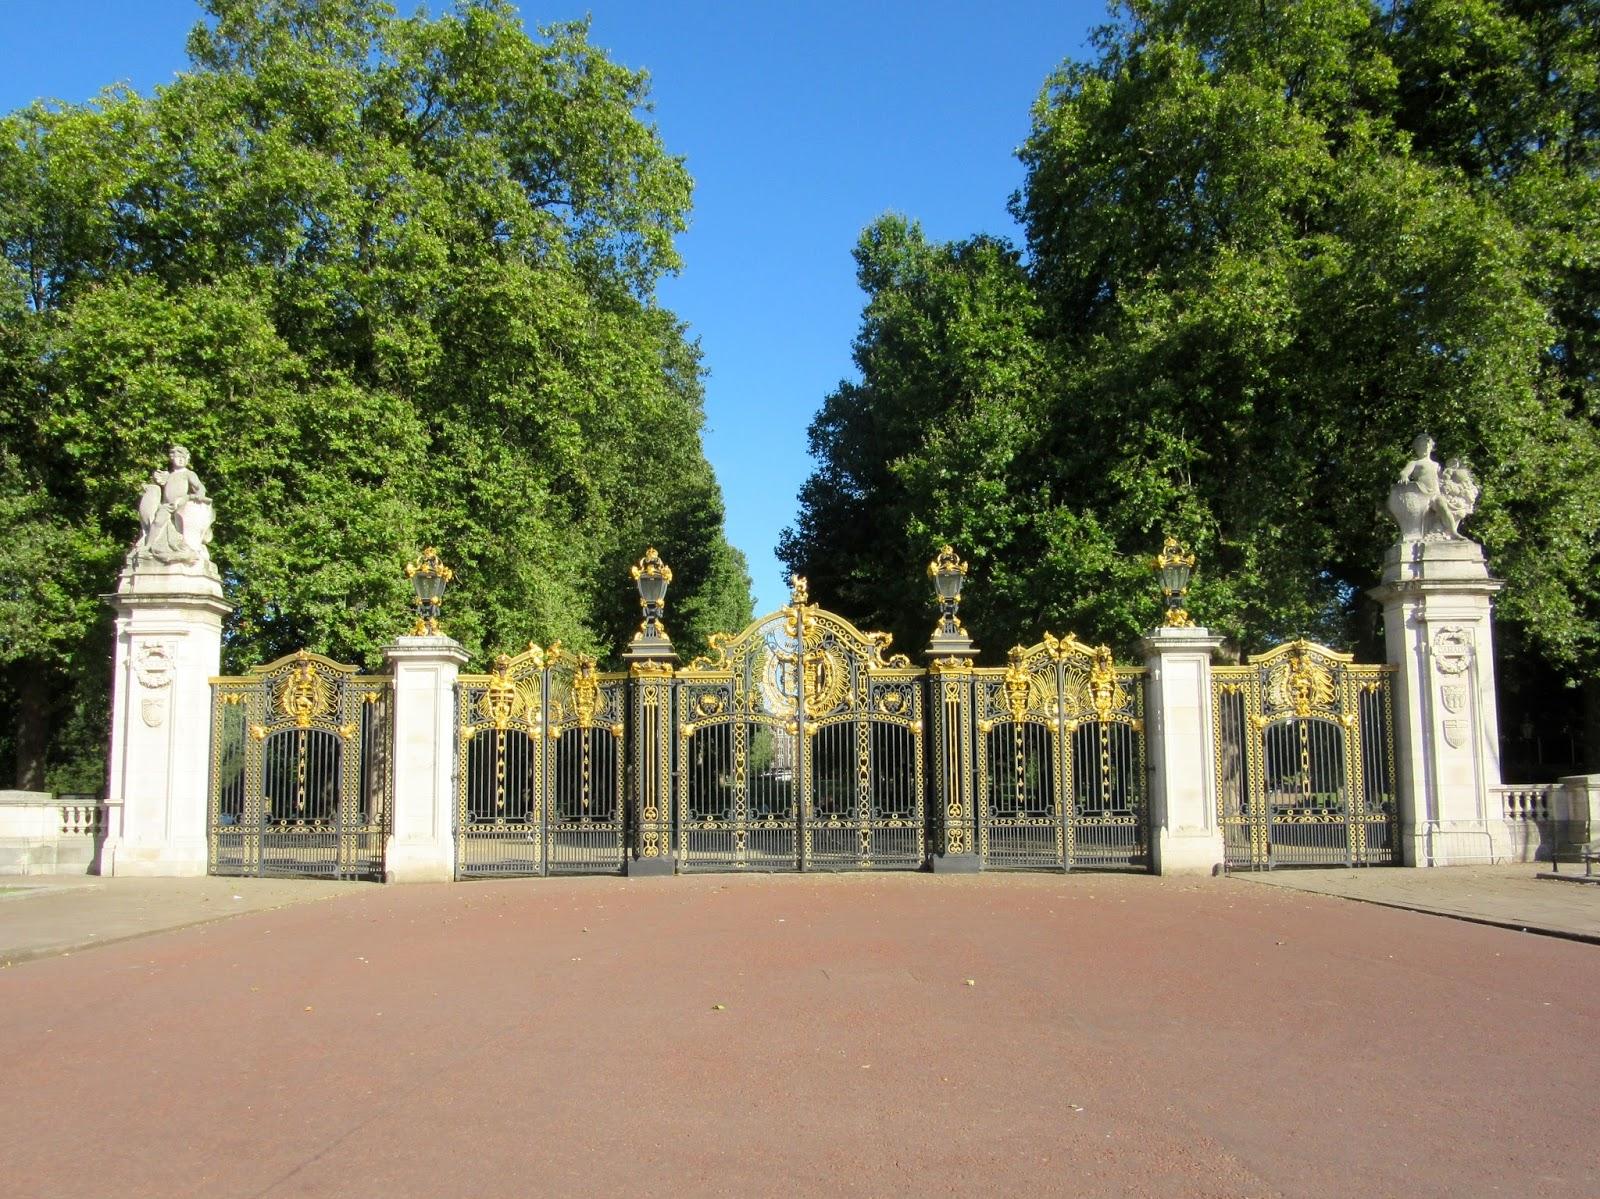 Destination: Fiction: Buckingham Palace & The Royal Mews